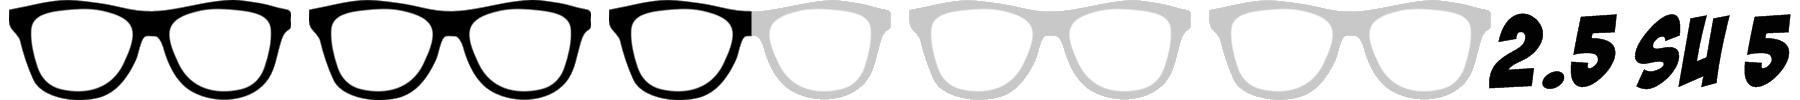 occhiali nerd 2.5 su 5